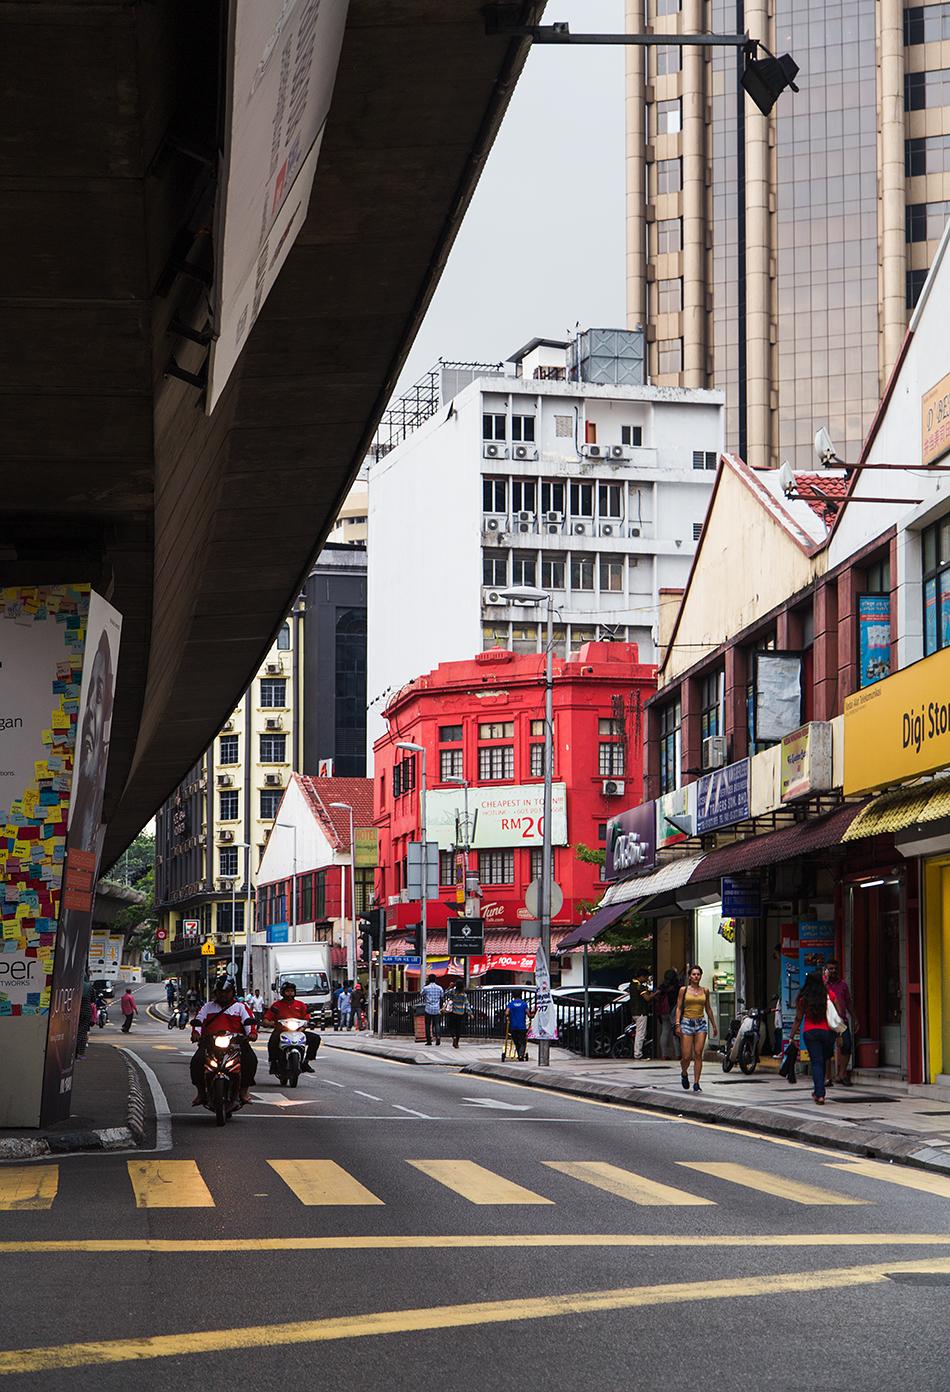 Kuala Lumpur, Jalan Tun Perak